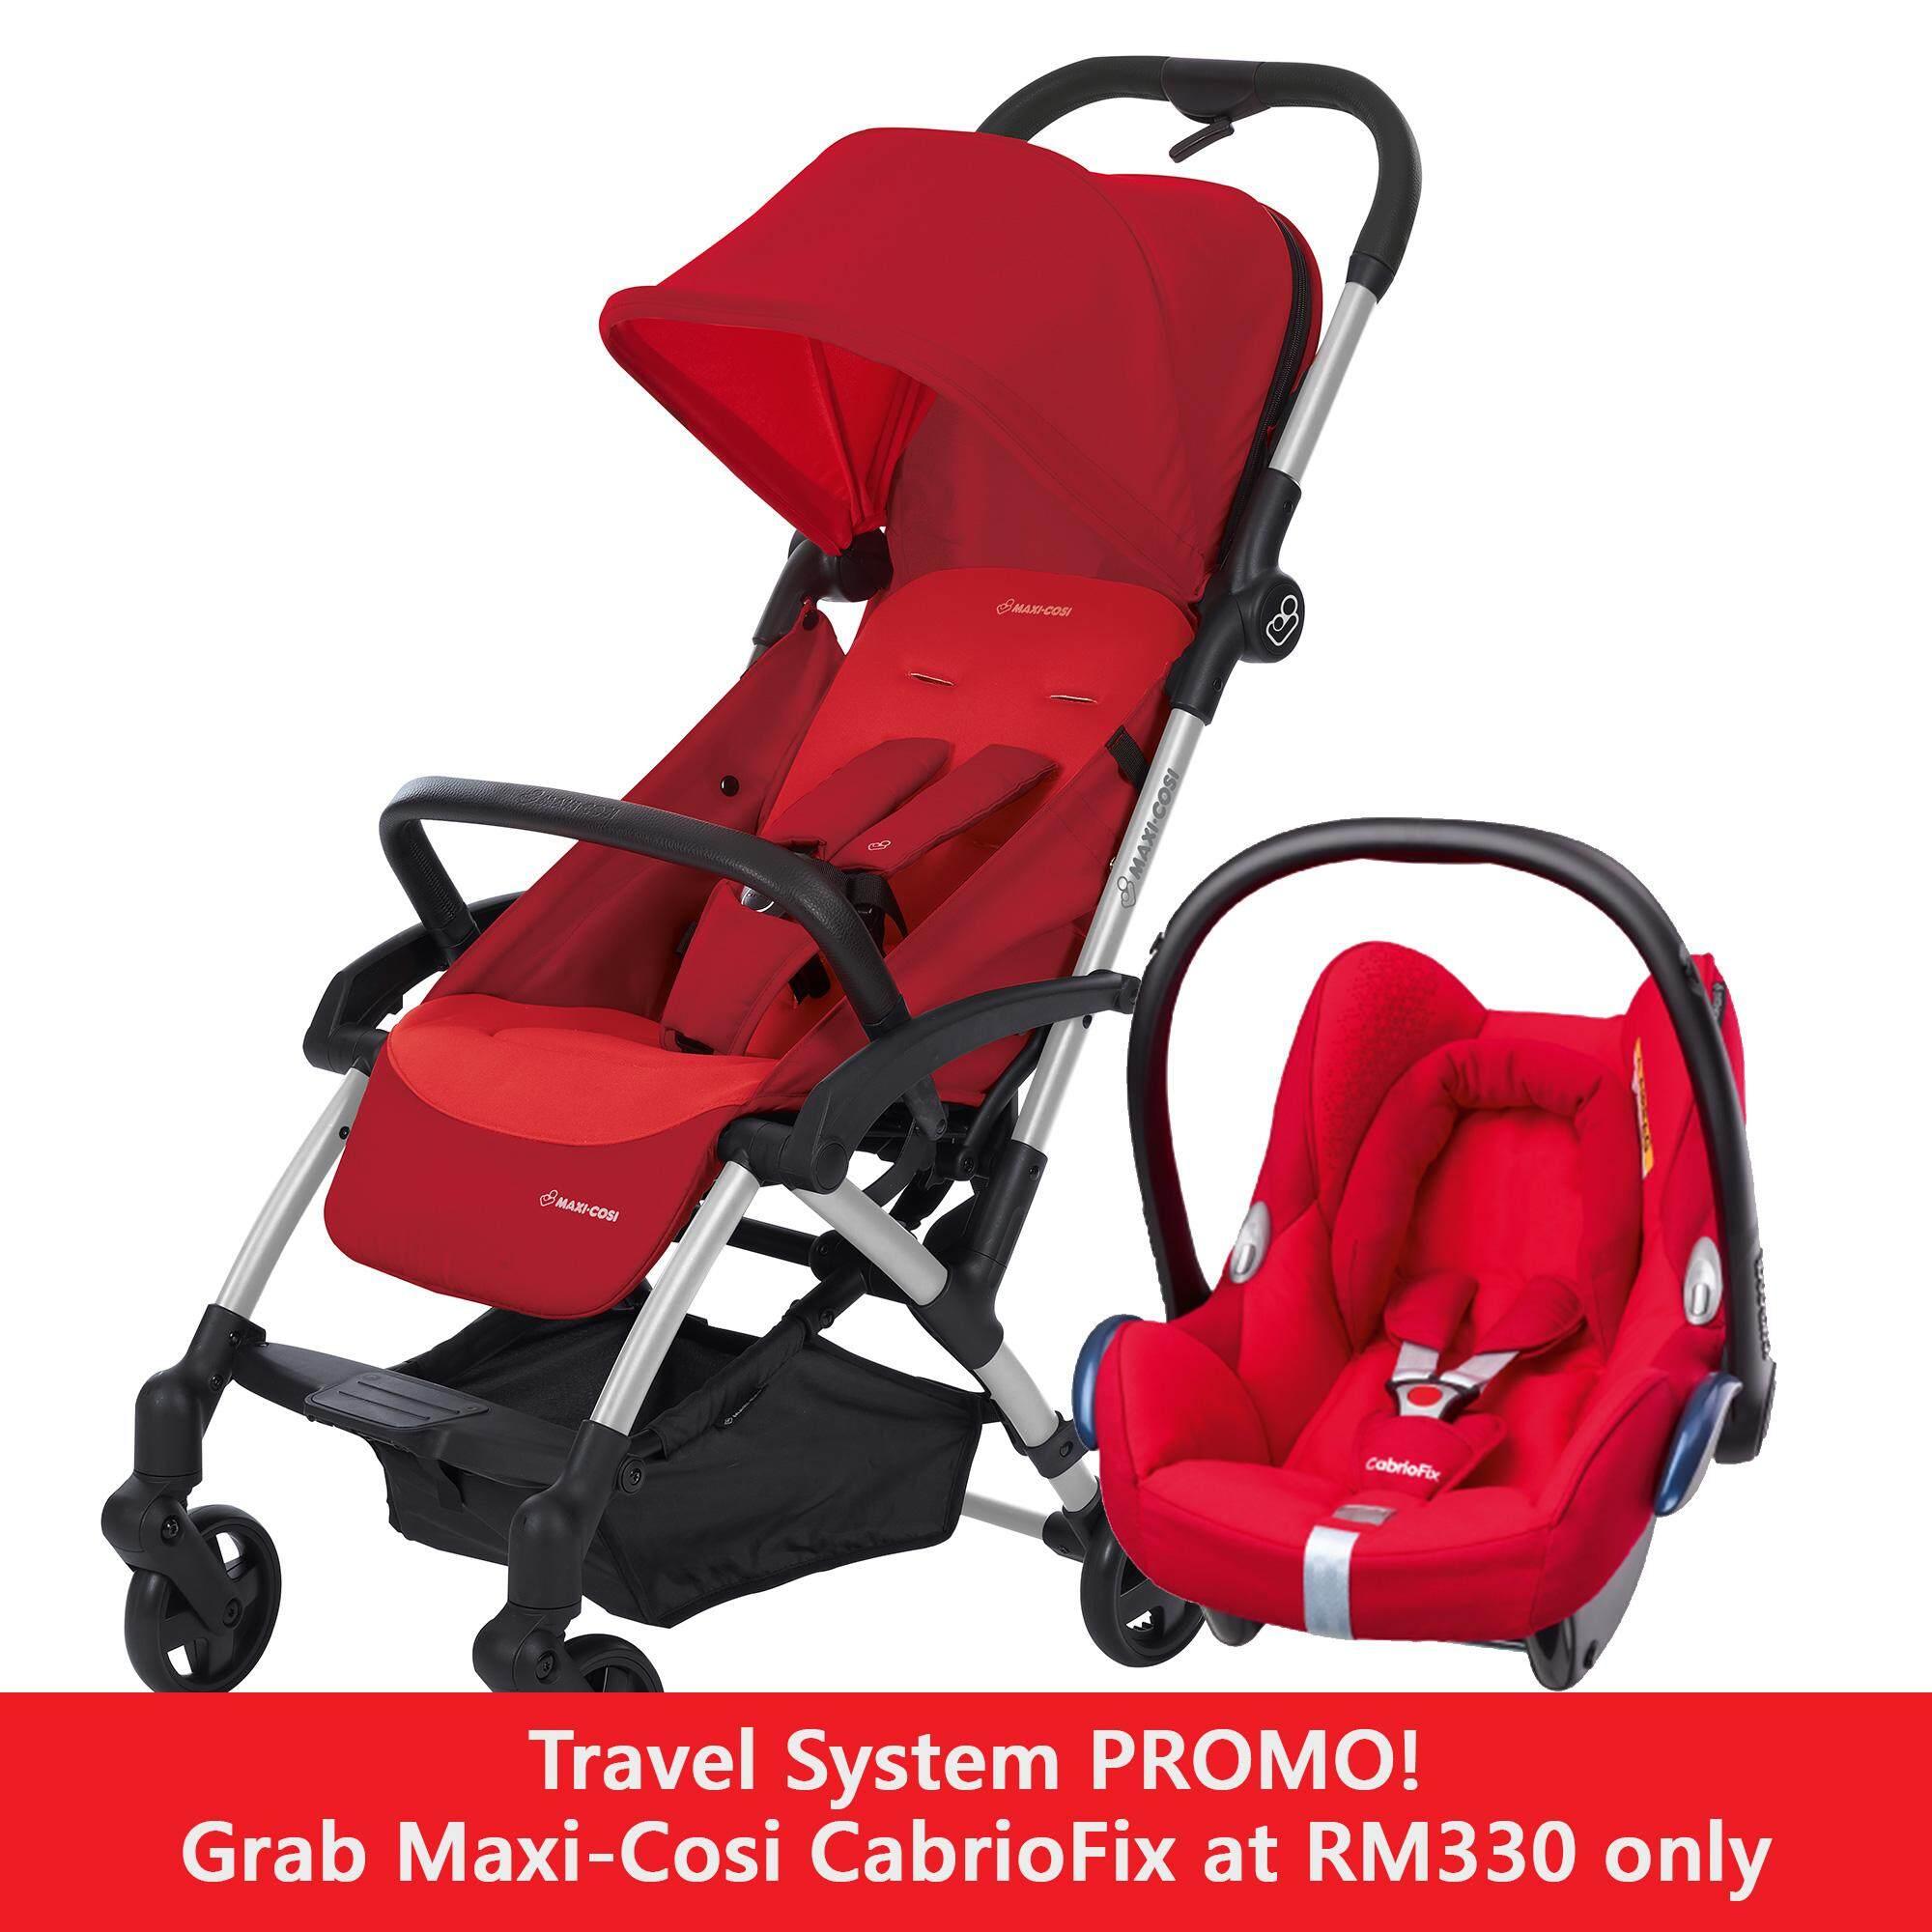 Maxi Cosi Travel System Laika Stroller CabriFix Car Seat